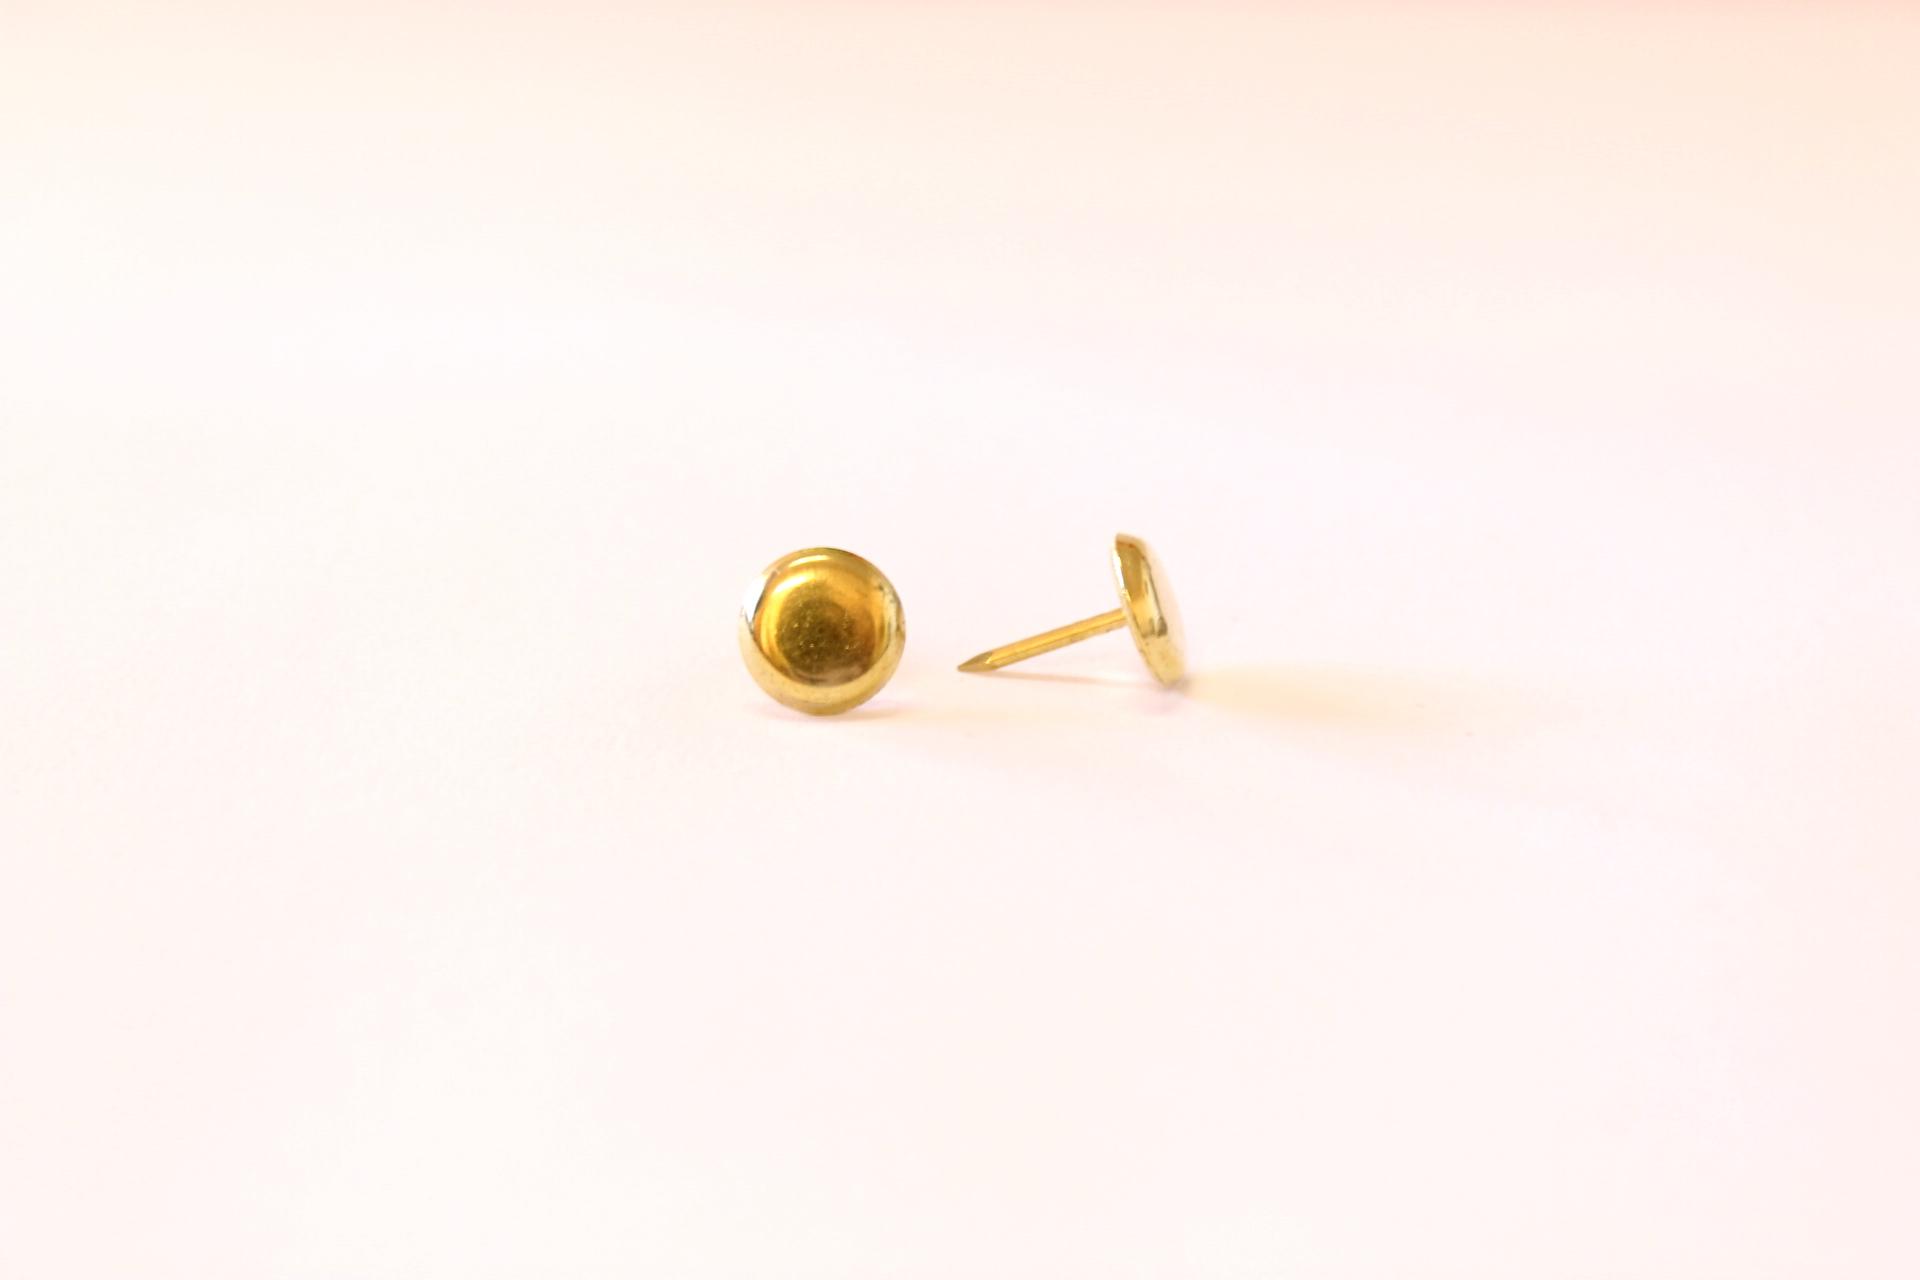 265 brass studs